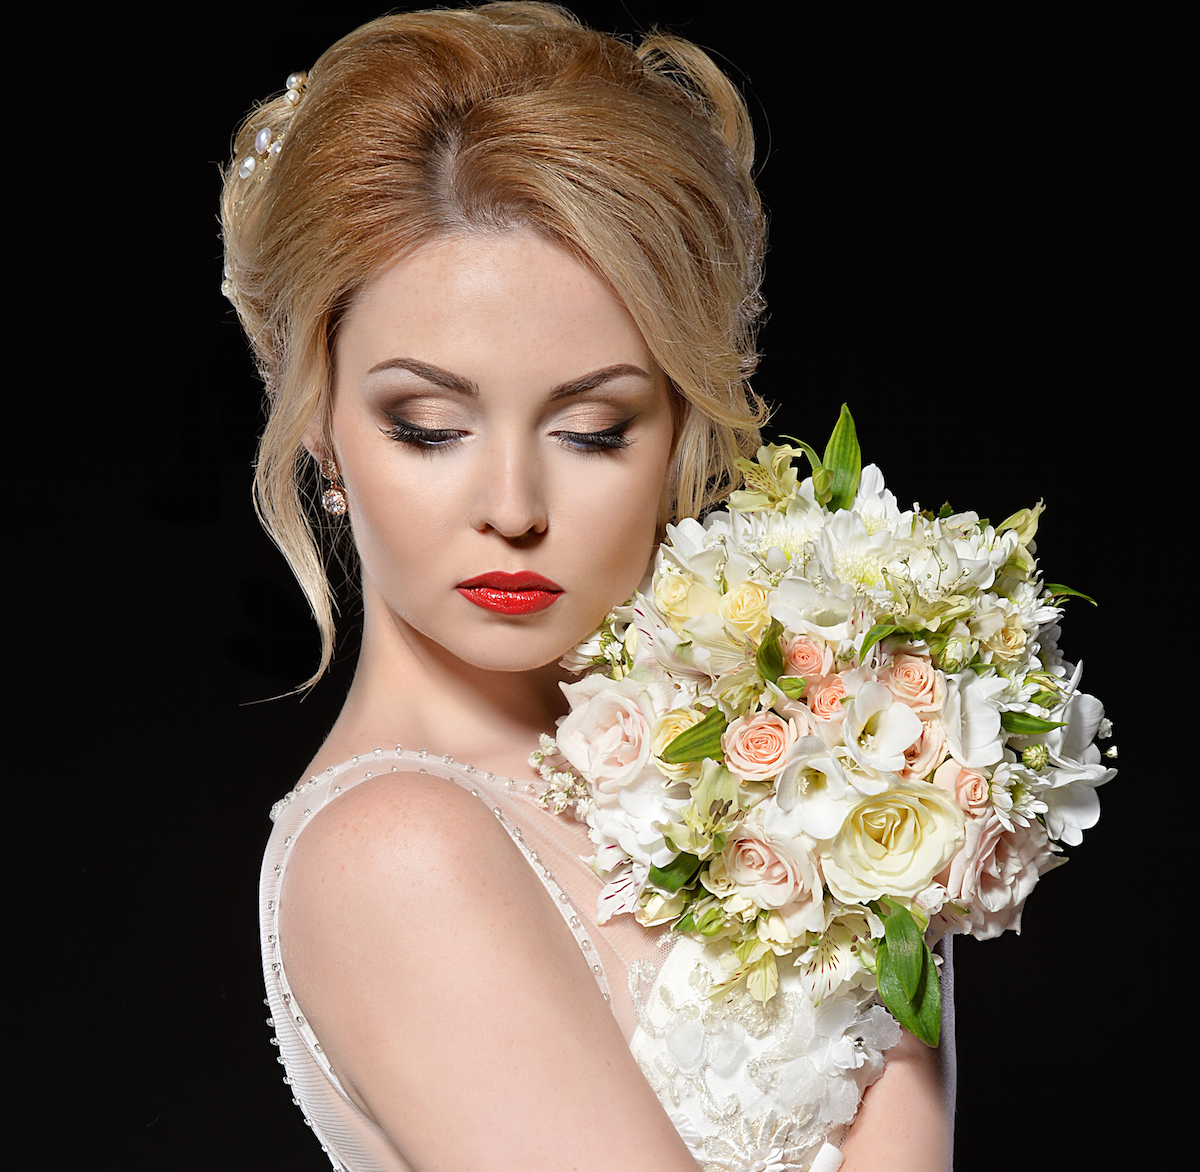 Bride Wore Red Lipstick 86